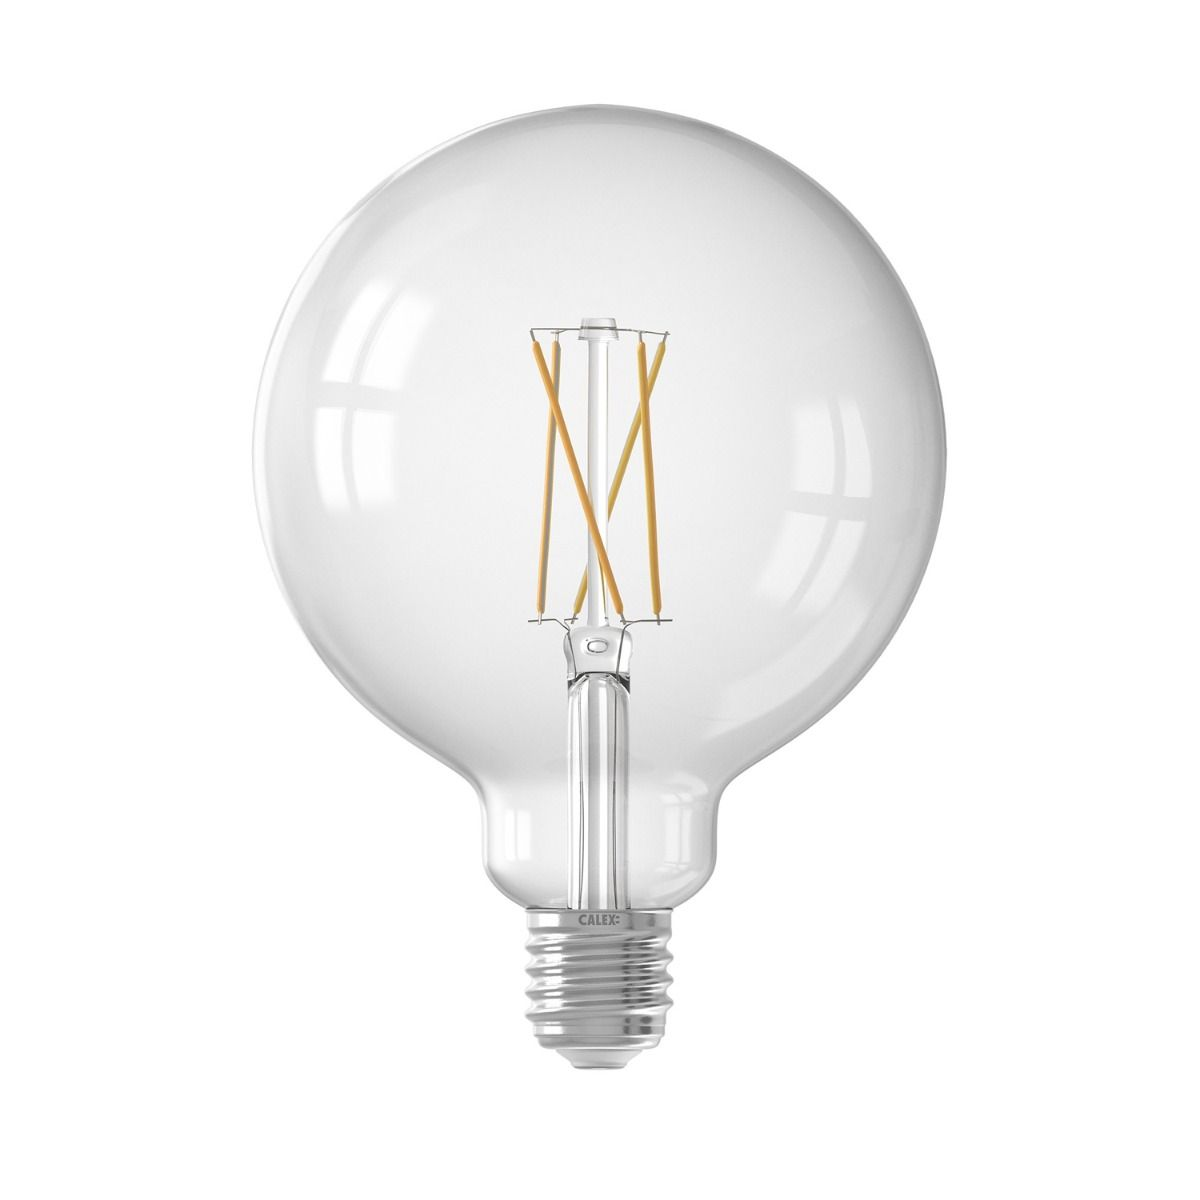 Calex Smart Globe G125 E27 7,5W 1055lm 1800-3000K Fadenlampe | Tuya Wifi